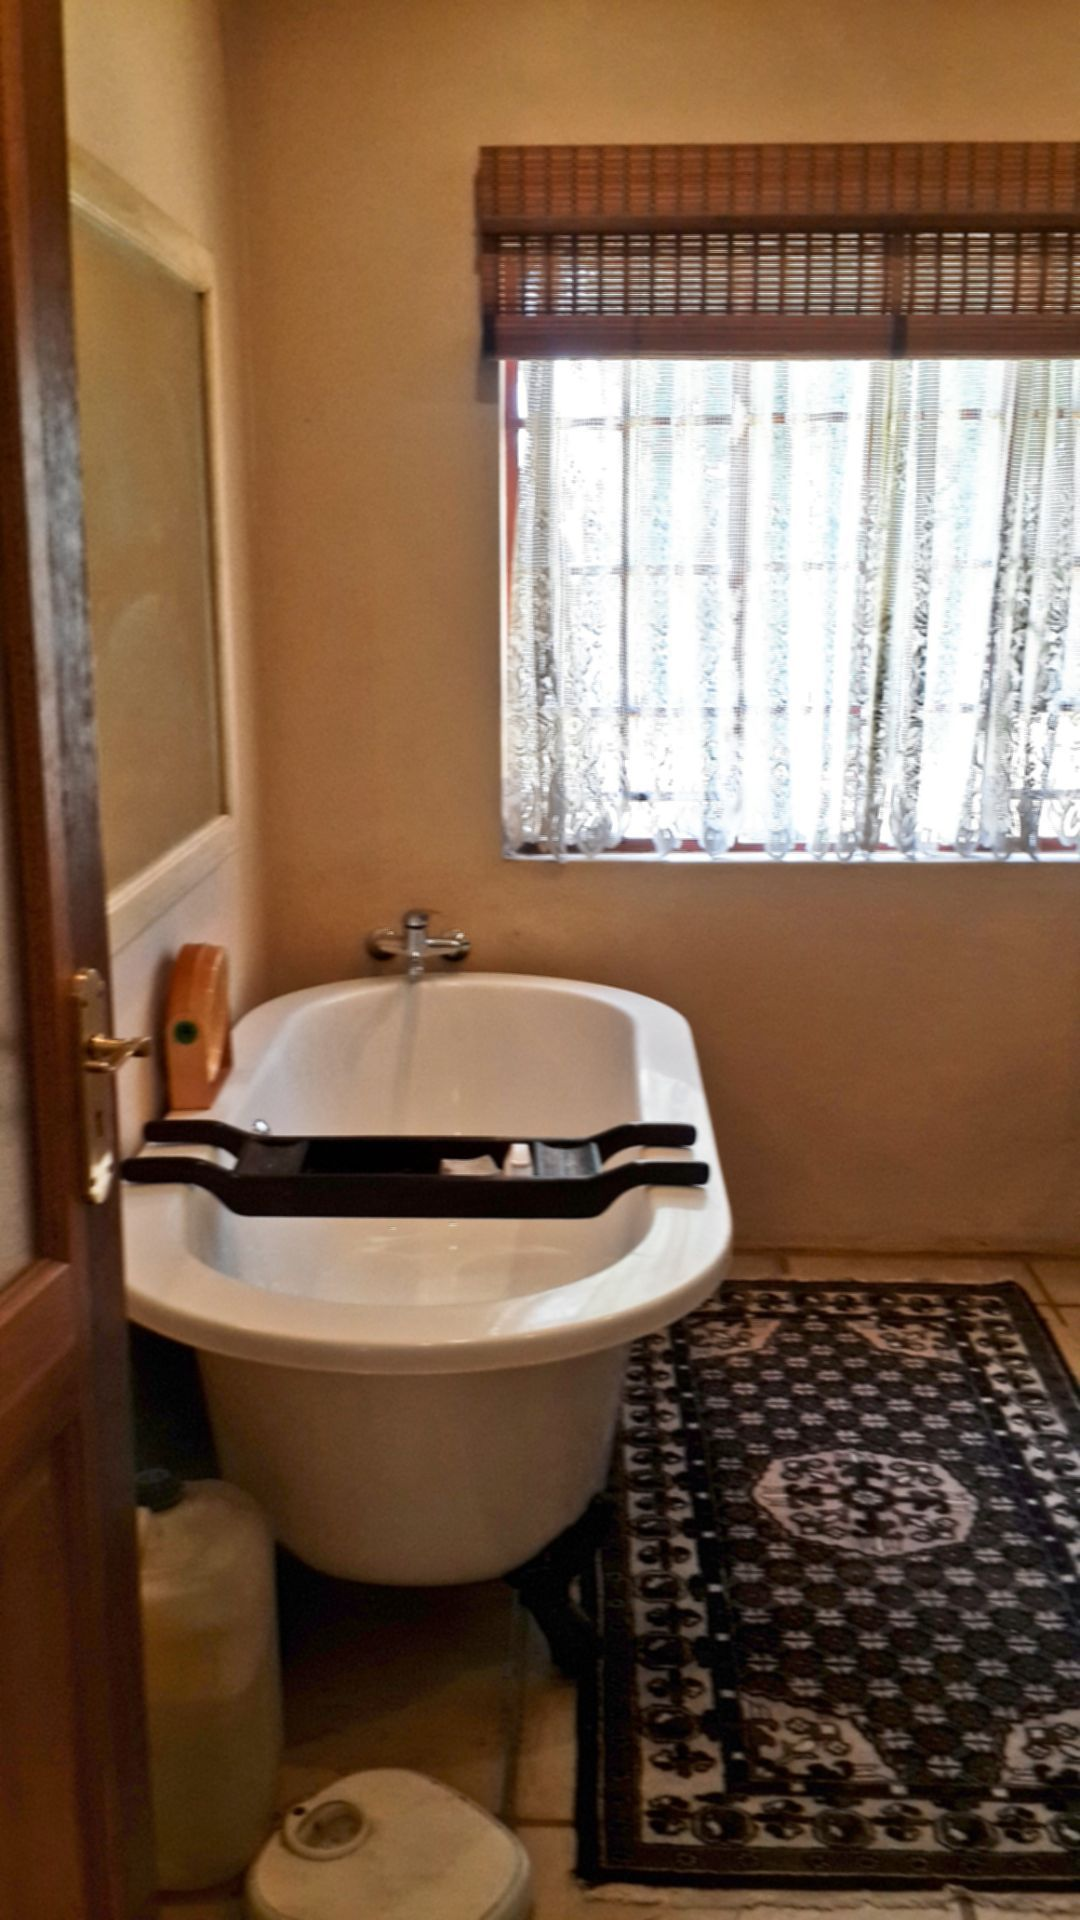 Bath Airb&b.jpg